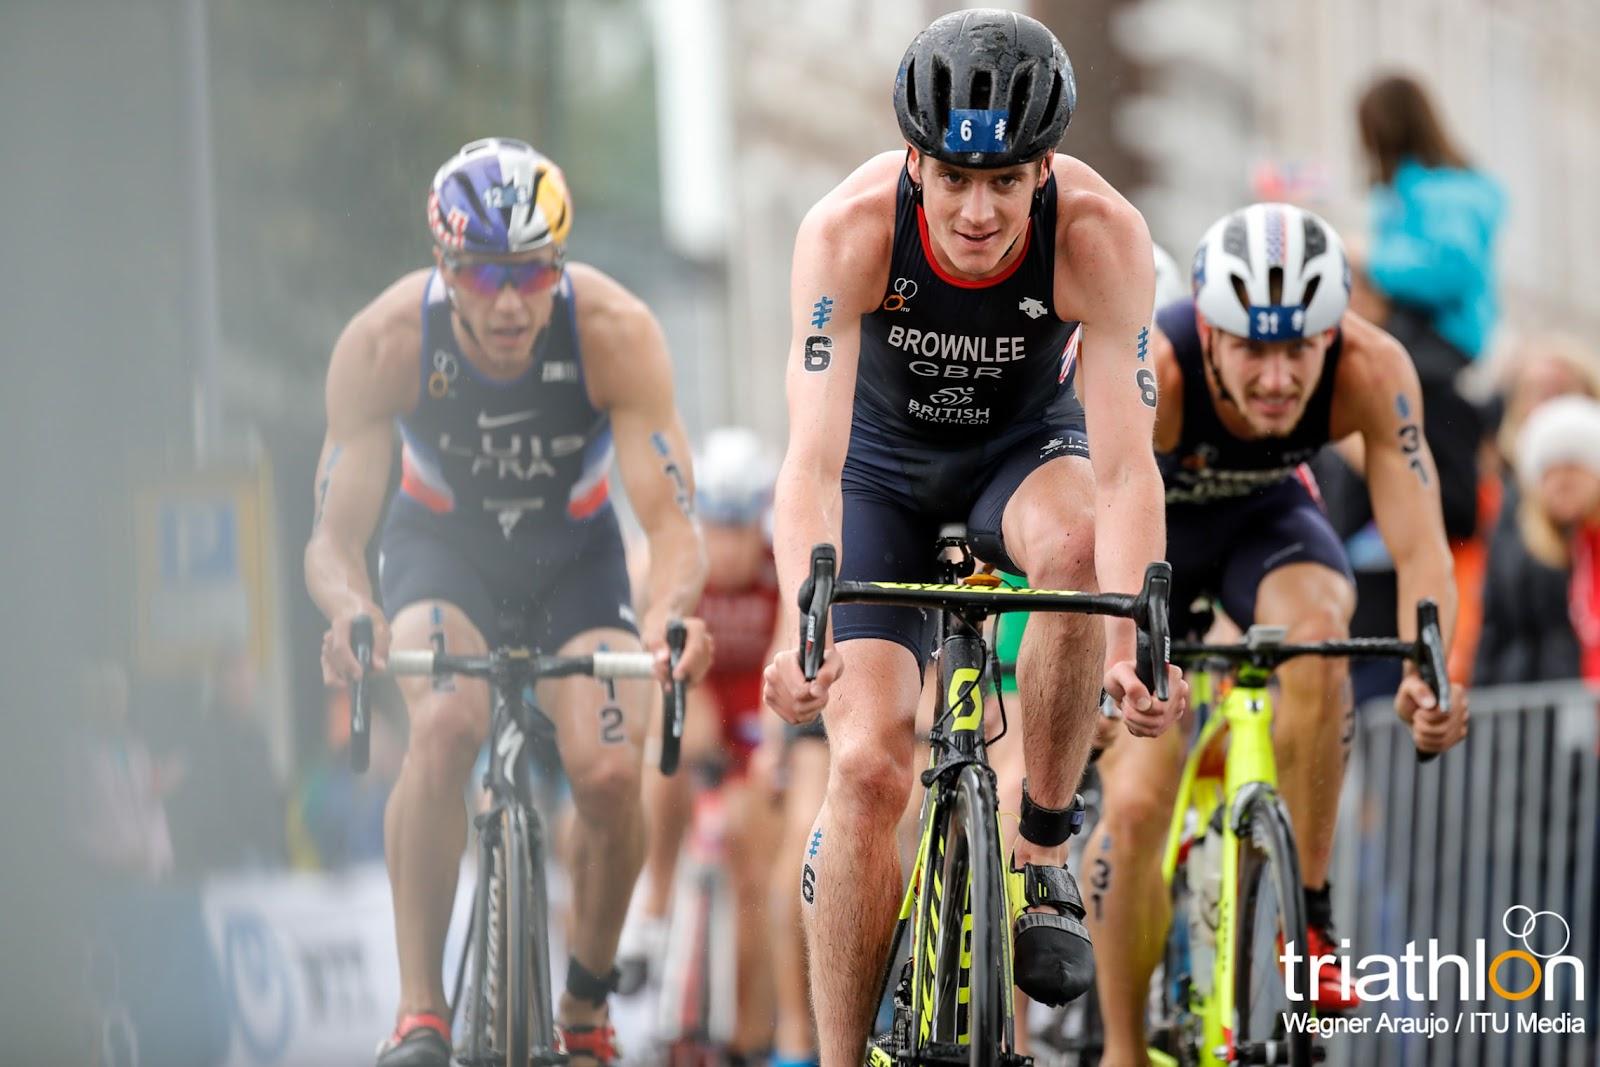 Rotterdam mężczyźni rower.jpg